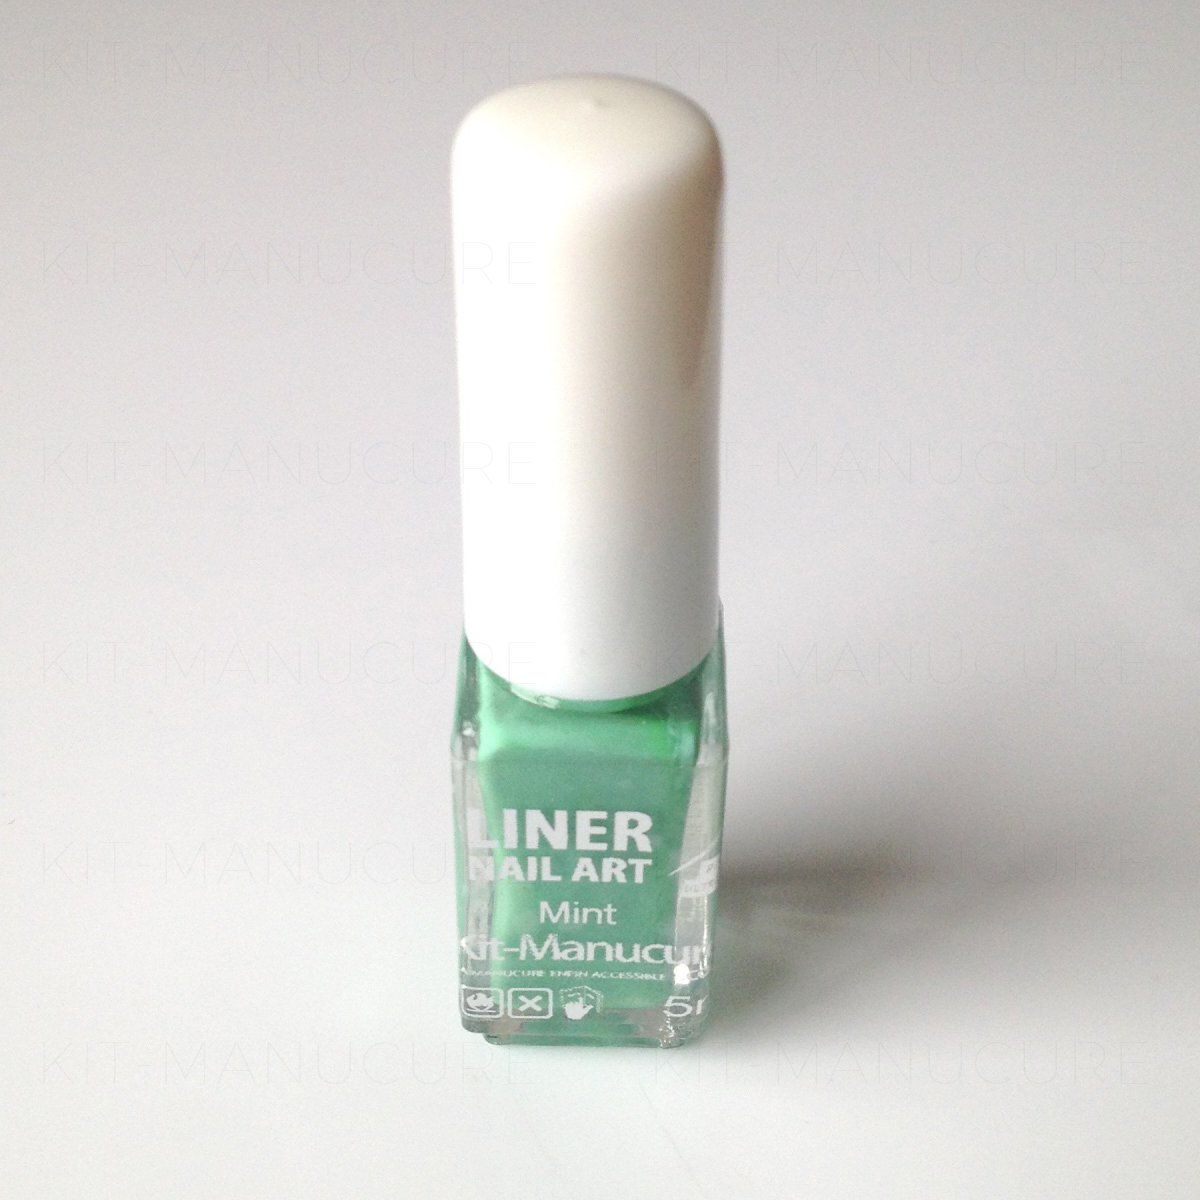 https://www.kit-manucure.com/662-thickbox_default/liner-nail-art-vert.jpg